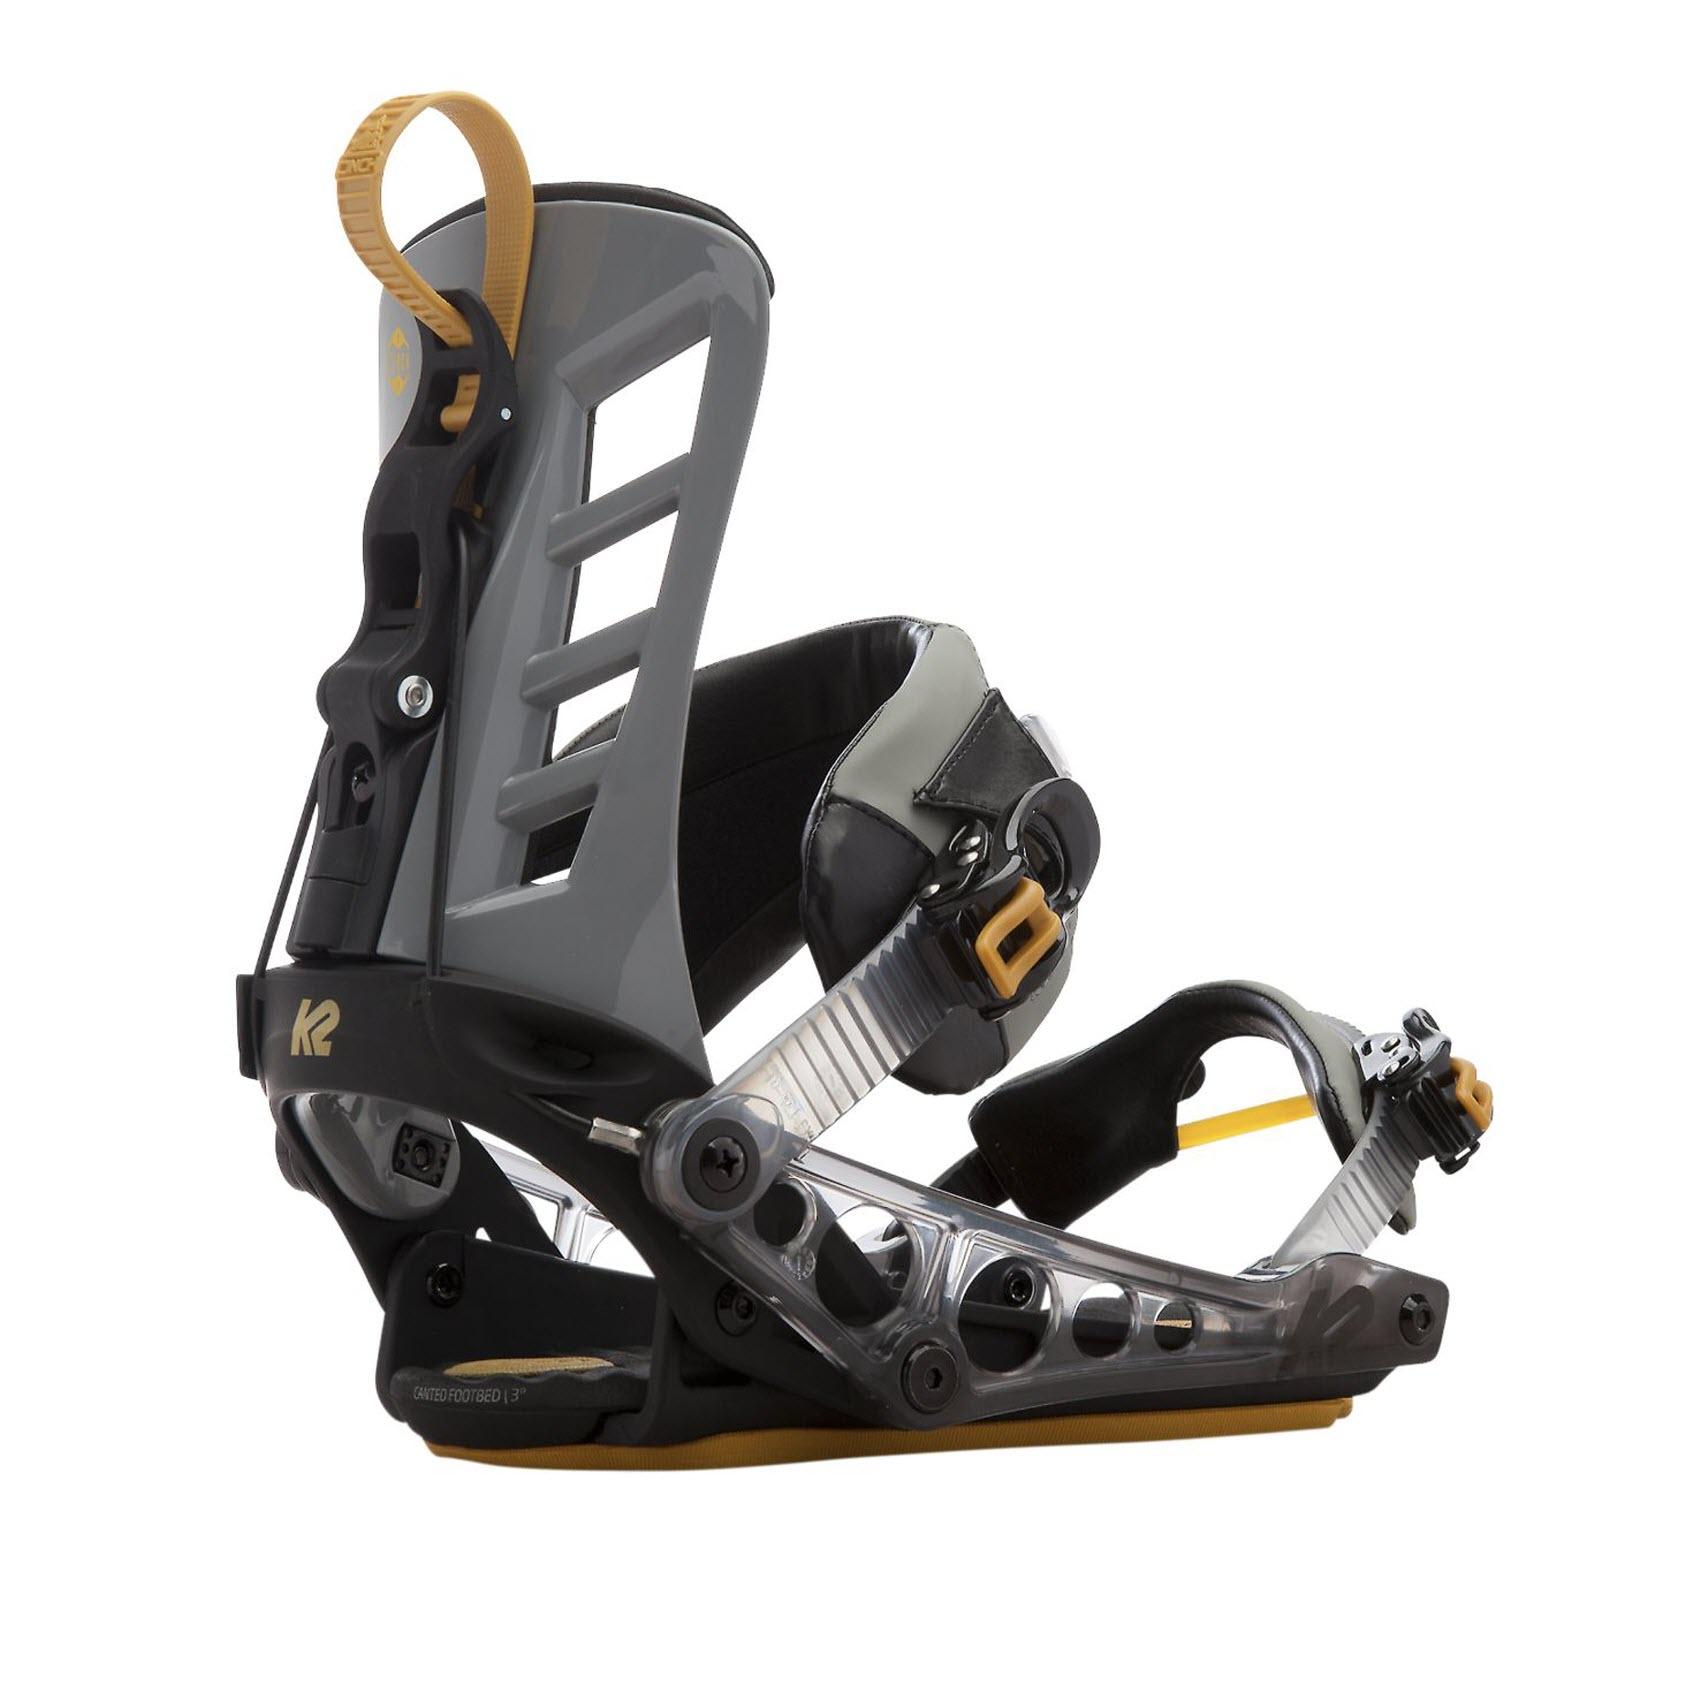 557d02a59706 Details about K2 Snowboard Bindings - Cinch TS - Rear Entry